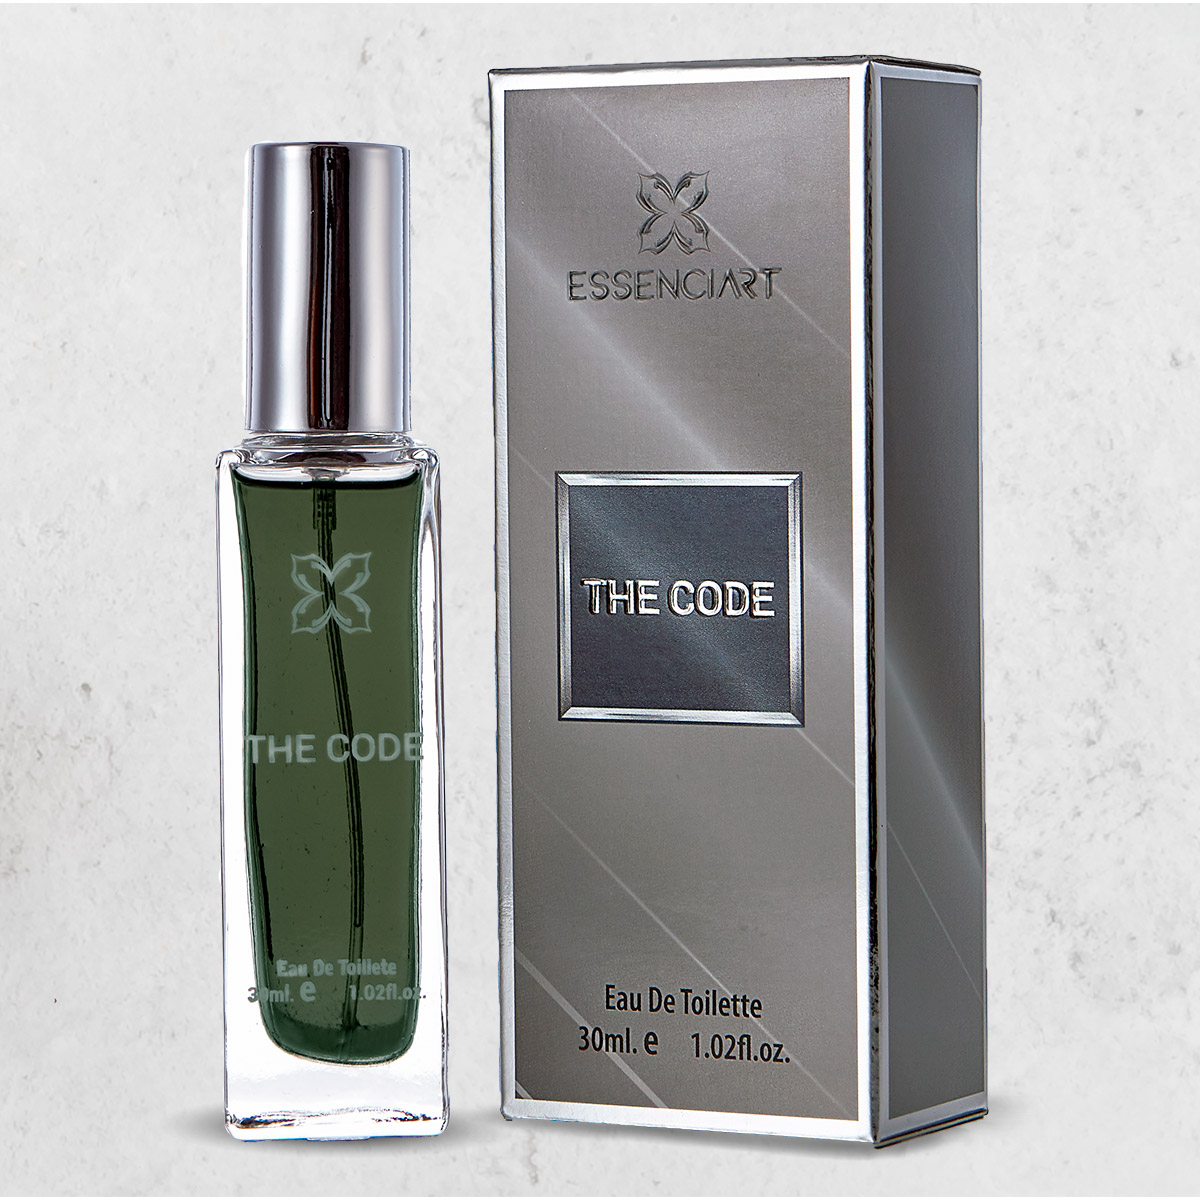 Essenciart The Code Perfume Masculino Importado Edt 30ml